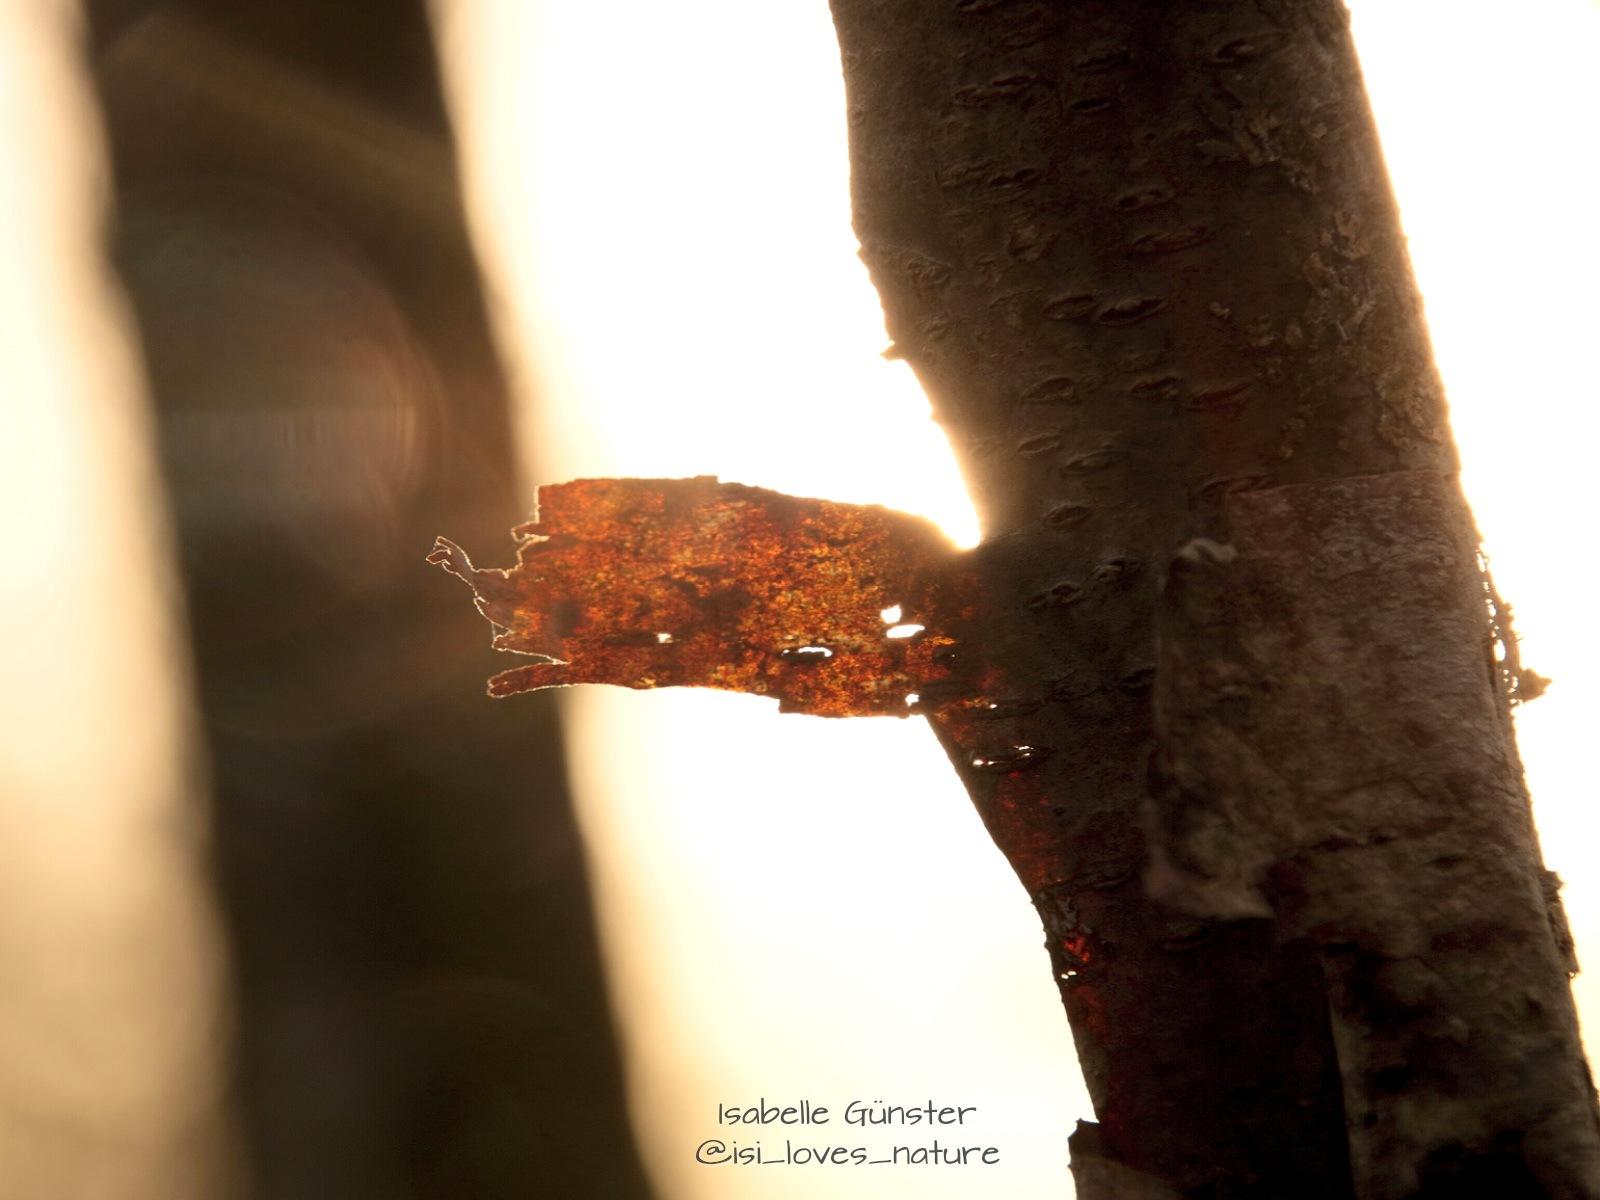 Sunlight 2 by Isabelle_guenster_fotografie